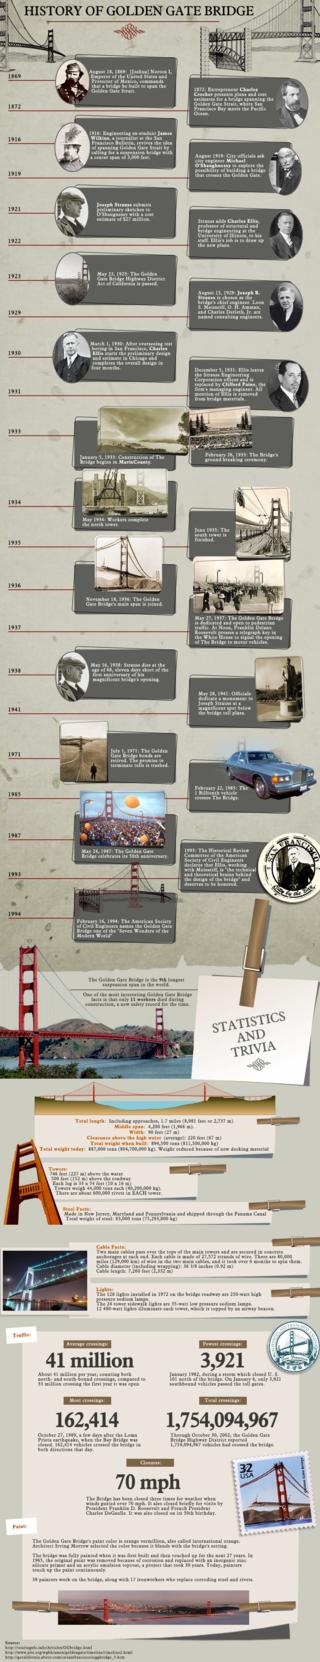 History-of-golden-gate-bridge